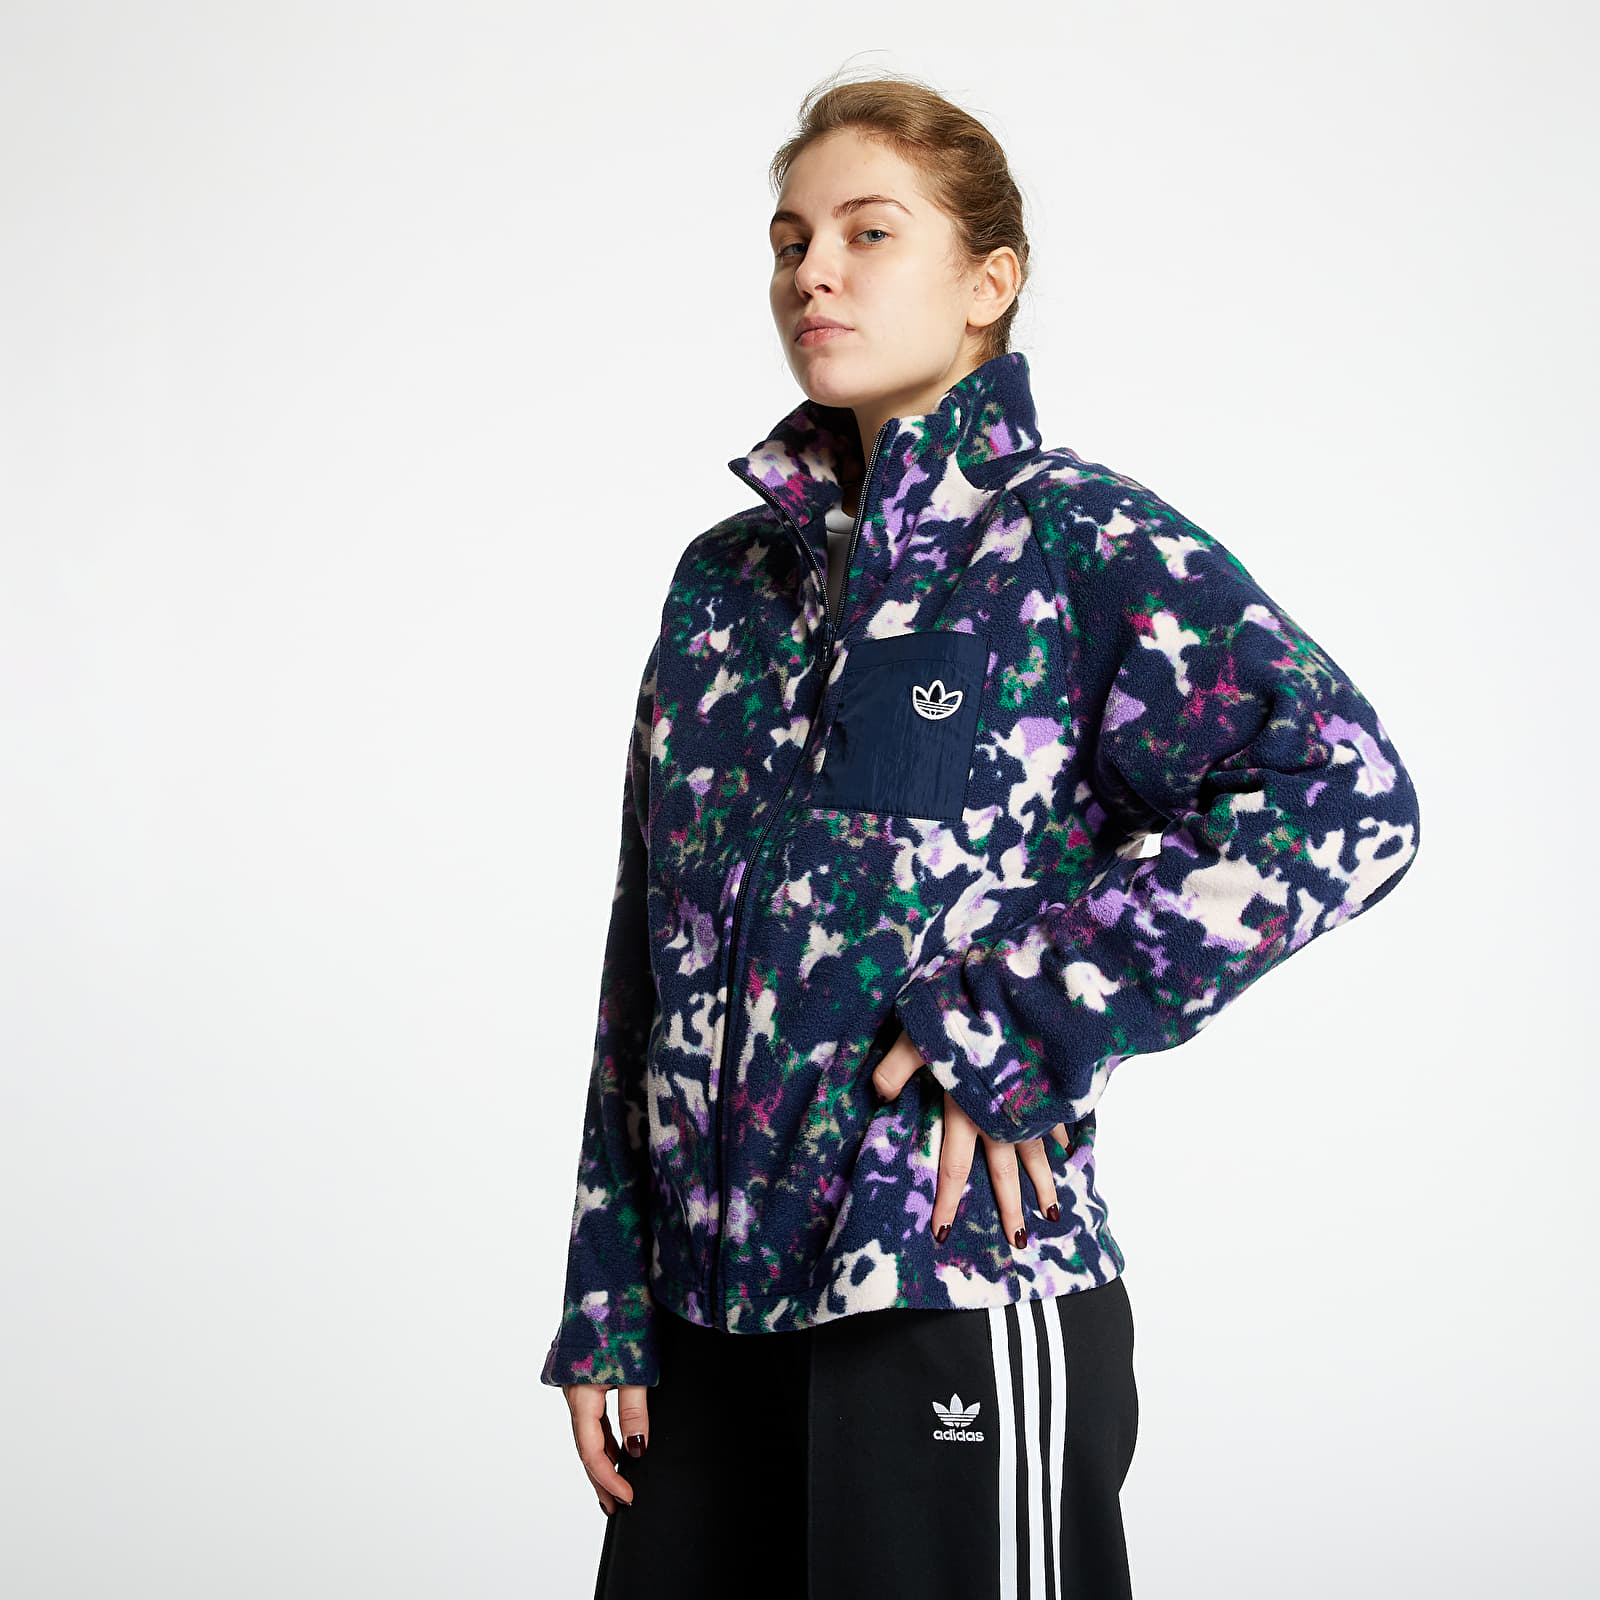 Sweatshirts adidas Full Zip Fleece Multicolor